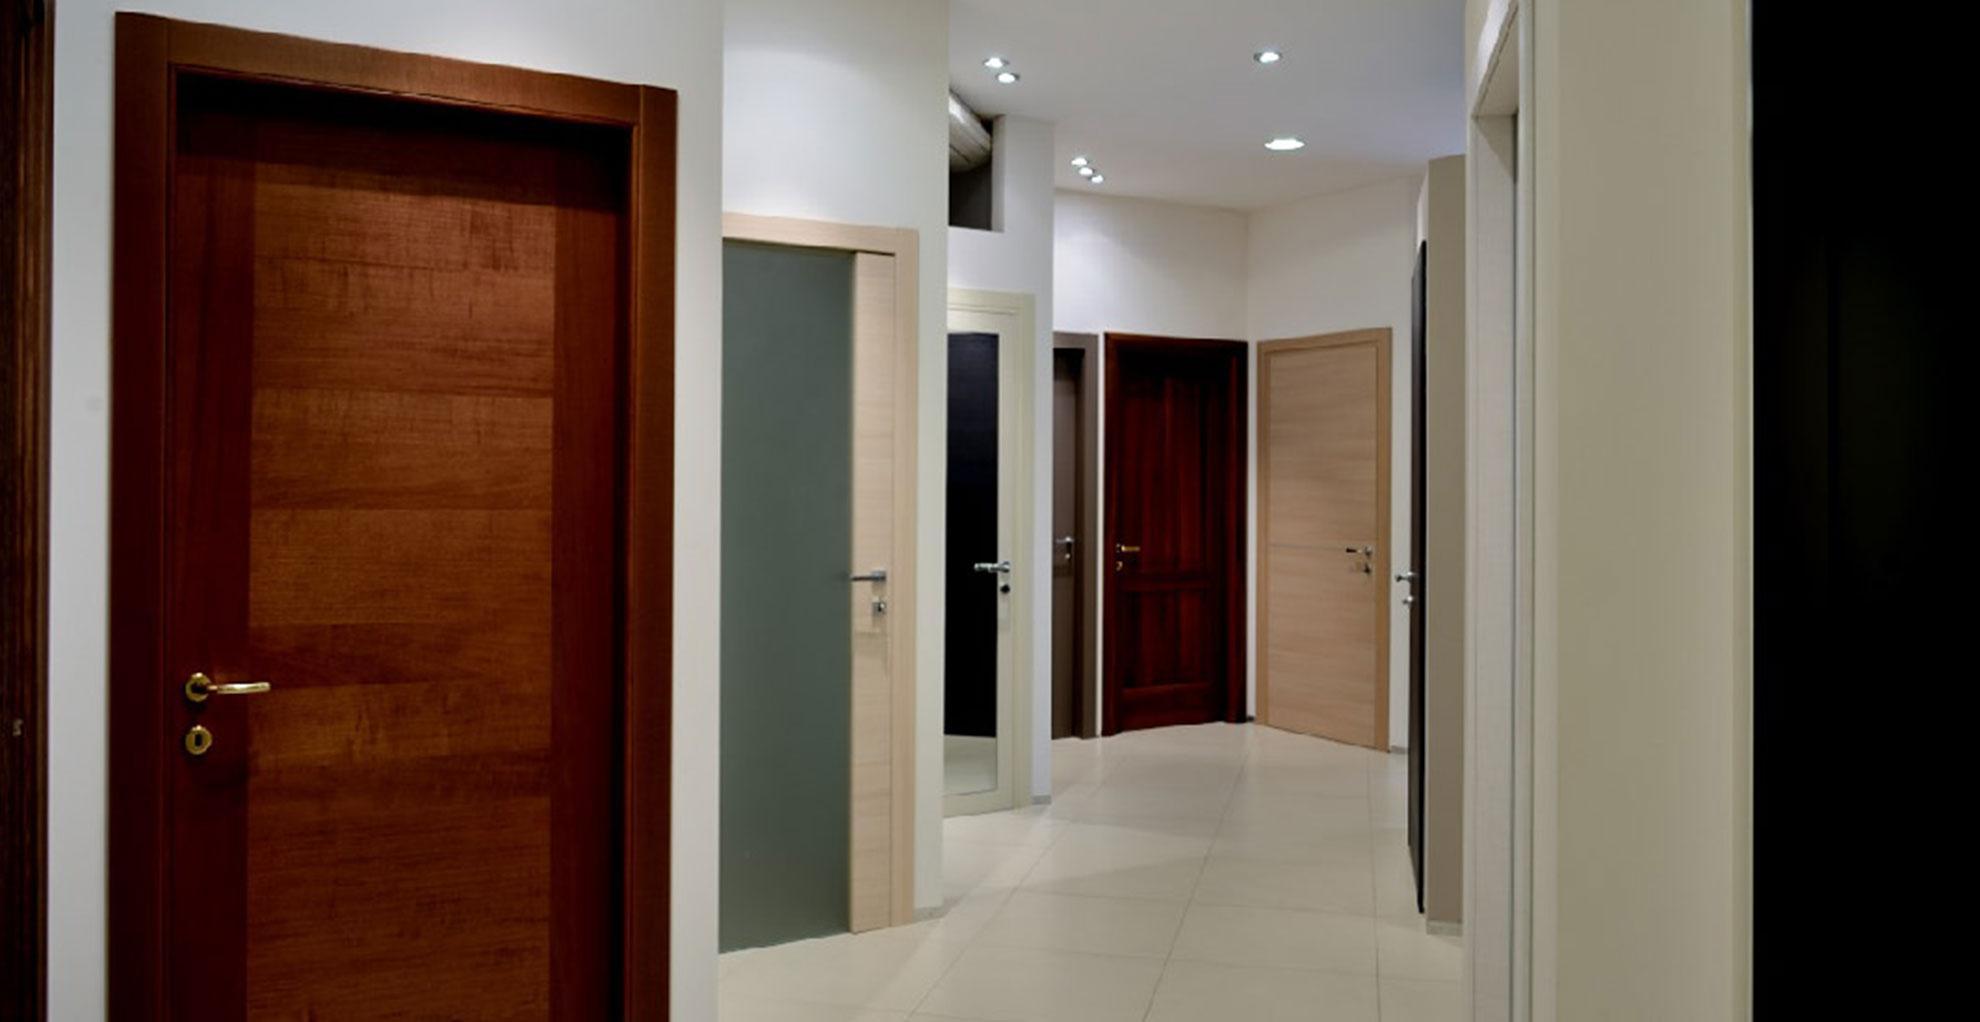 Arredo bagno stile spa arredo bagno con base sospesa per lavabo